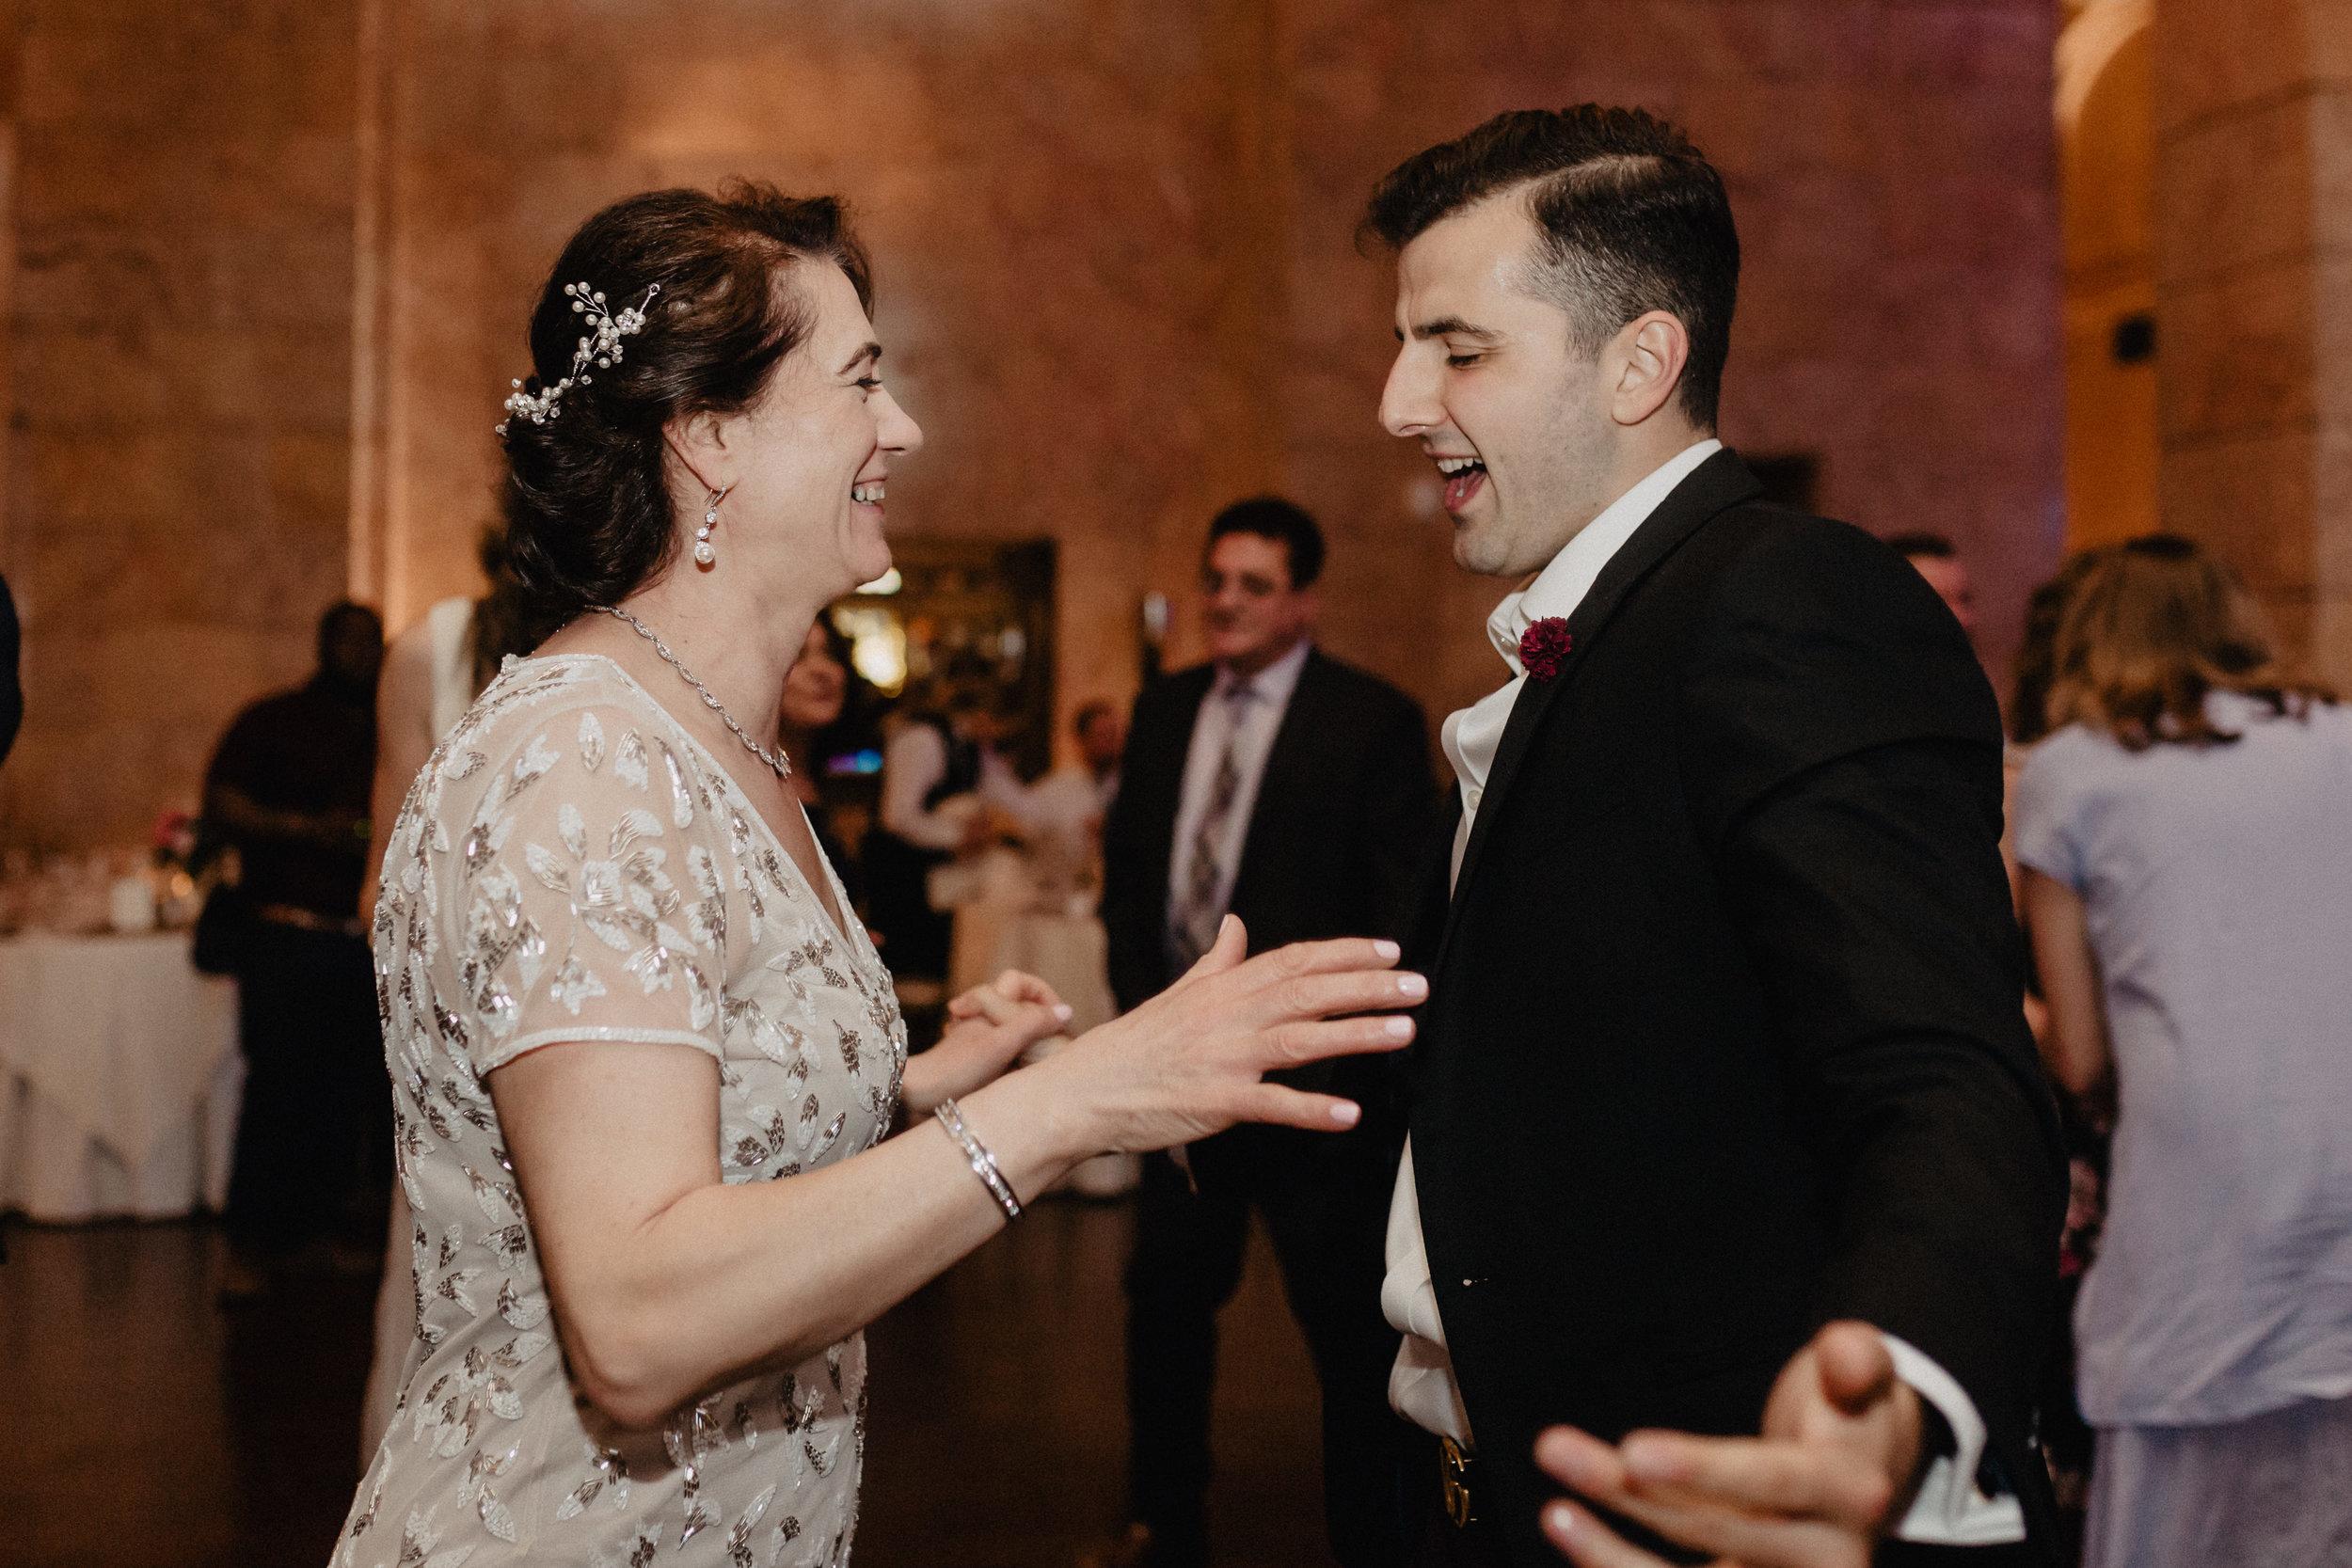 albany-new-york-wedding-69.jpg